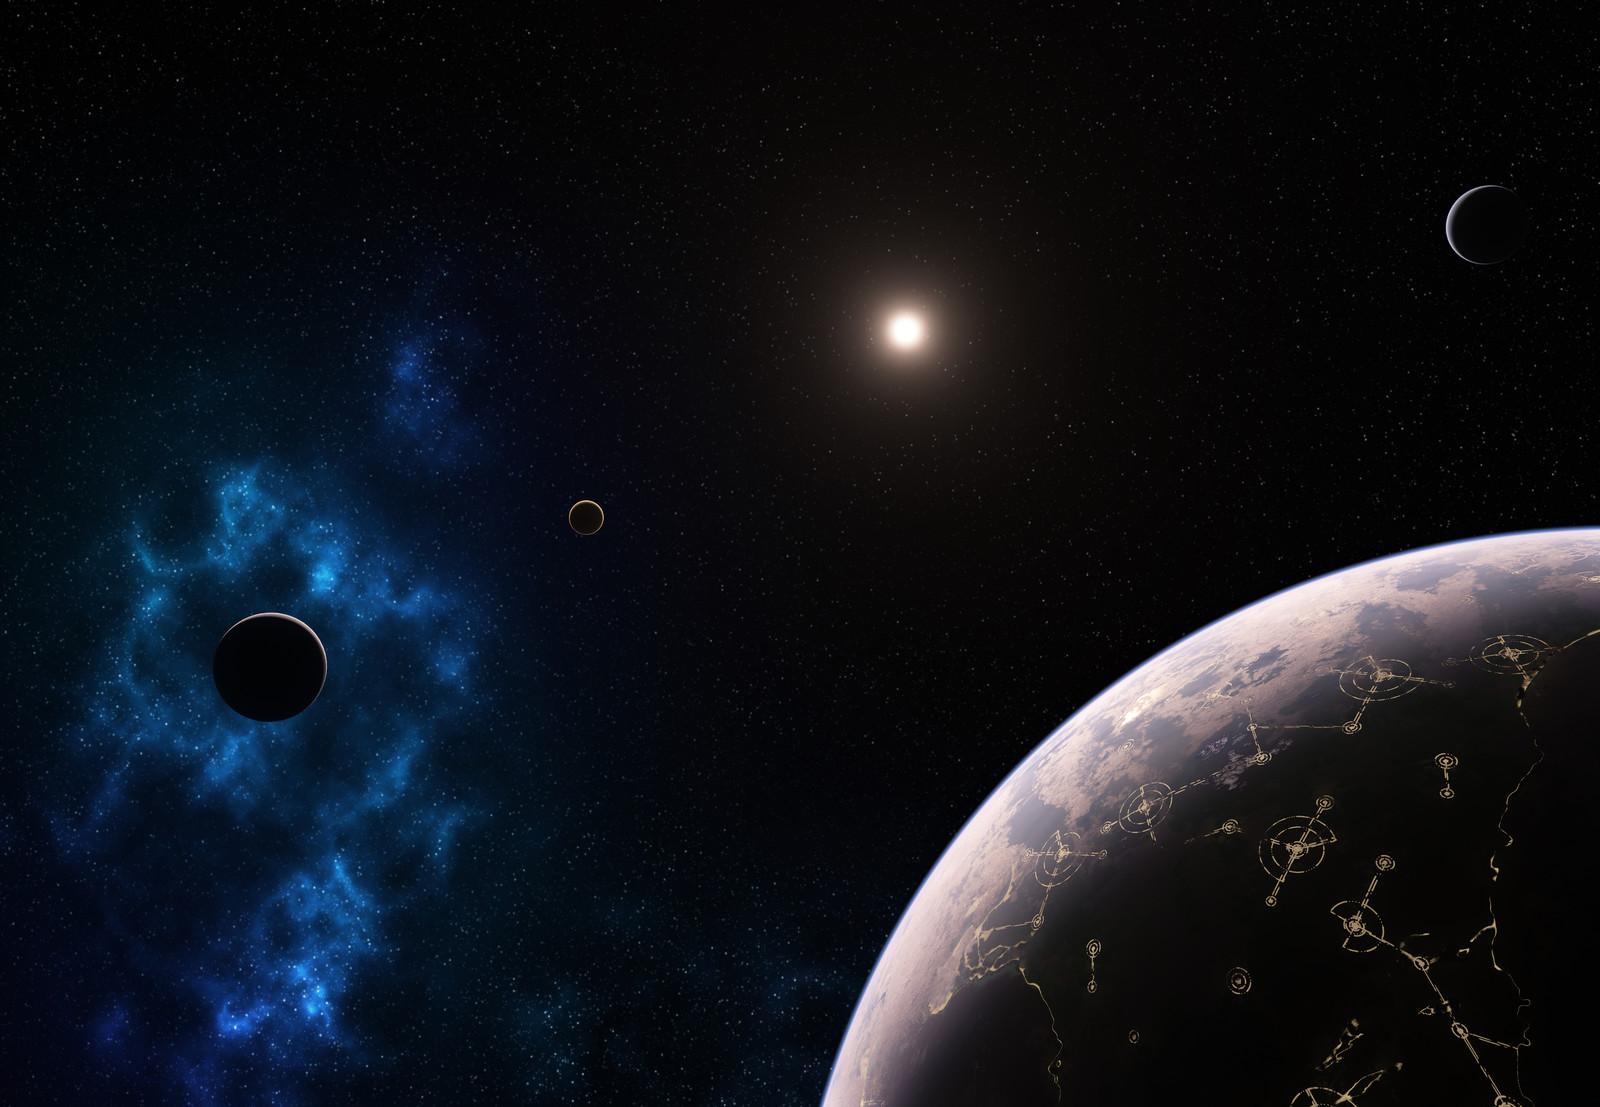 Disrupting Our Cosmic Solitude